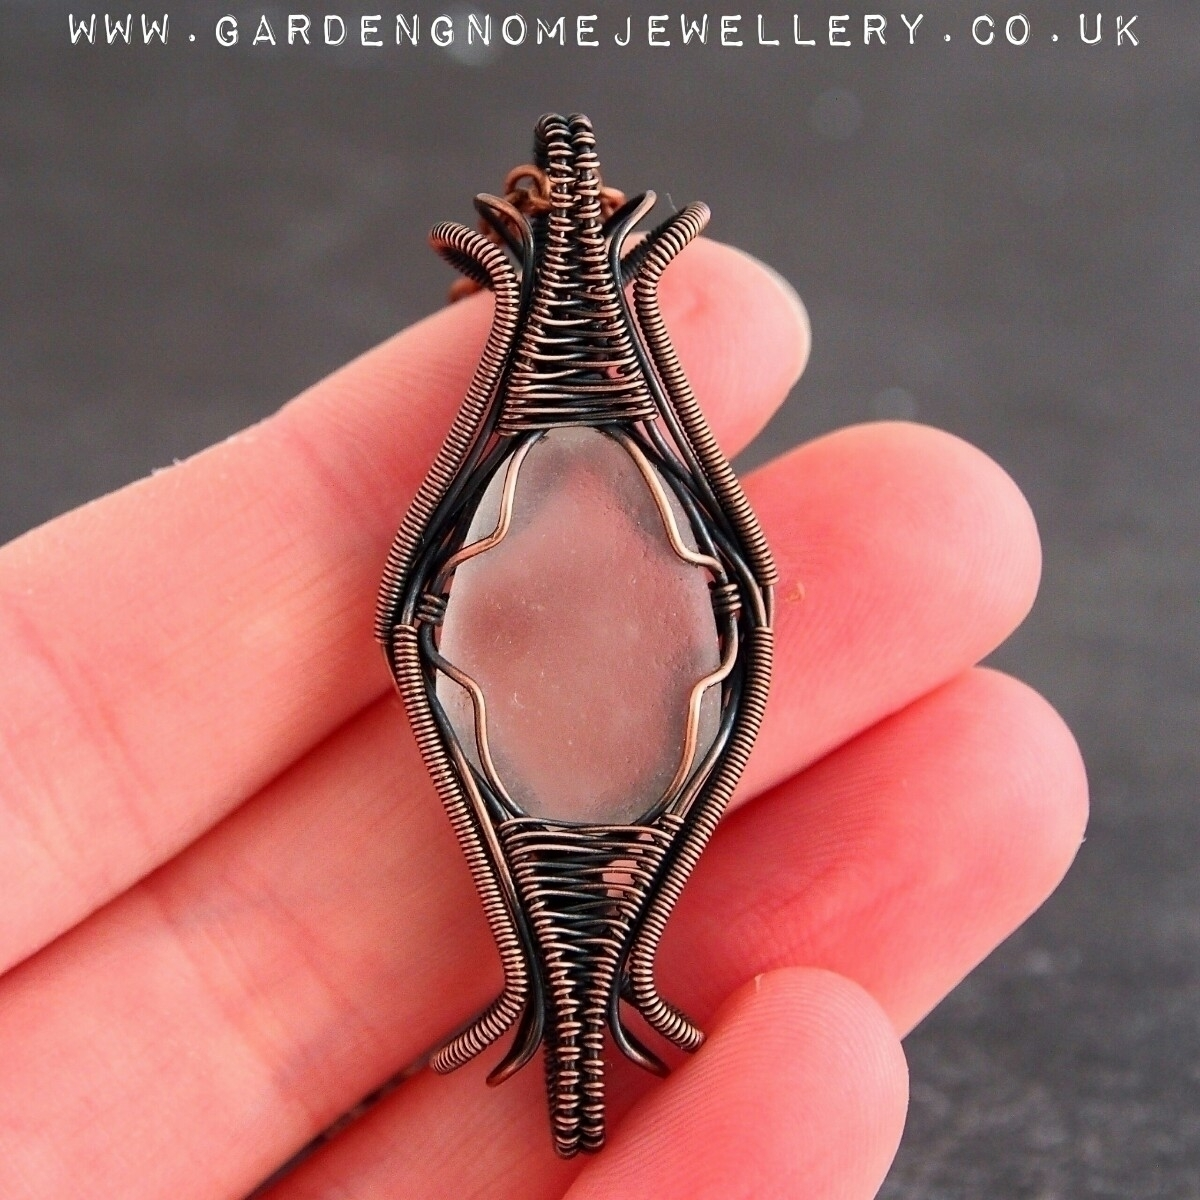 shop updated! added 4 pieces in - gardengnomejewellery | ello